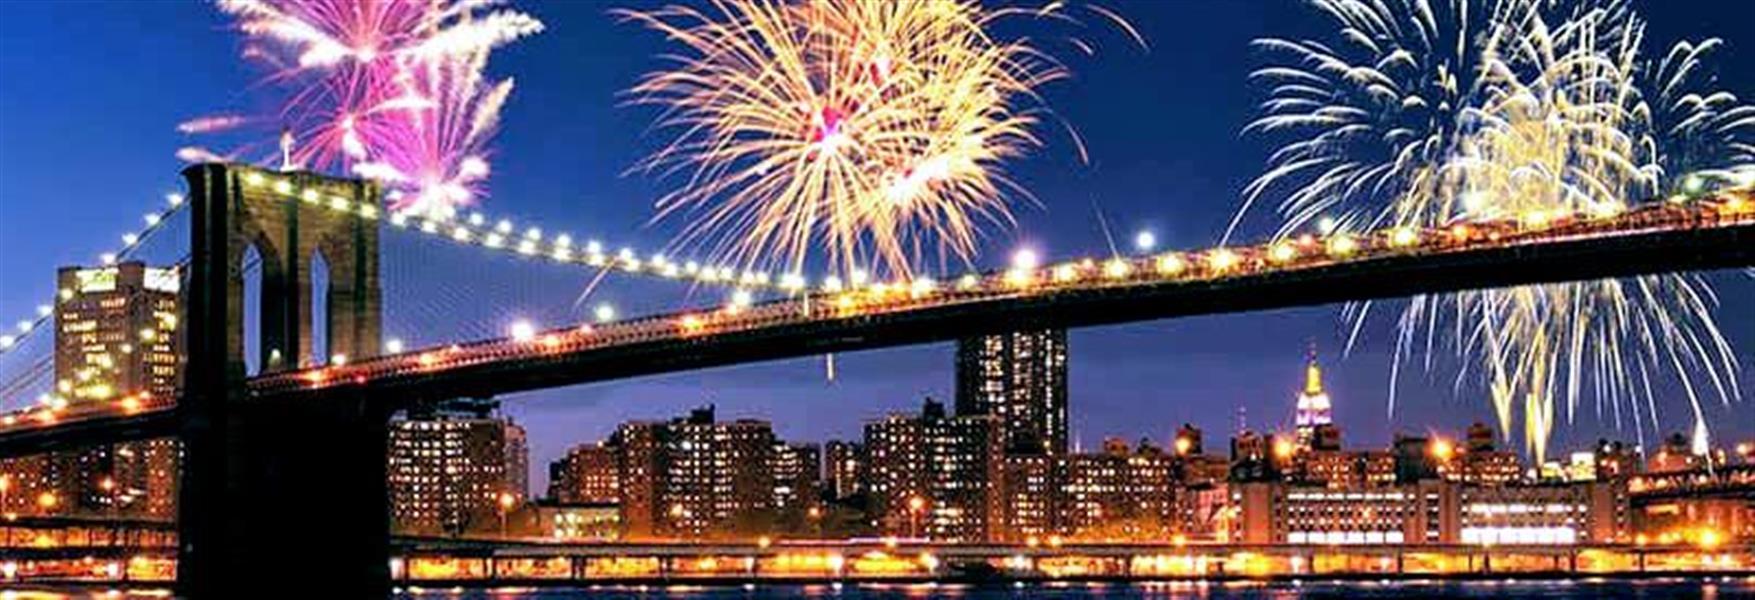 d10f0383-36ad-4e26-8188-9db4c696a953_july-4th-new-york-city.jpg